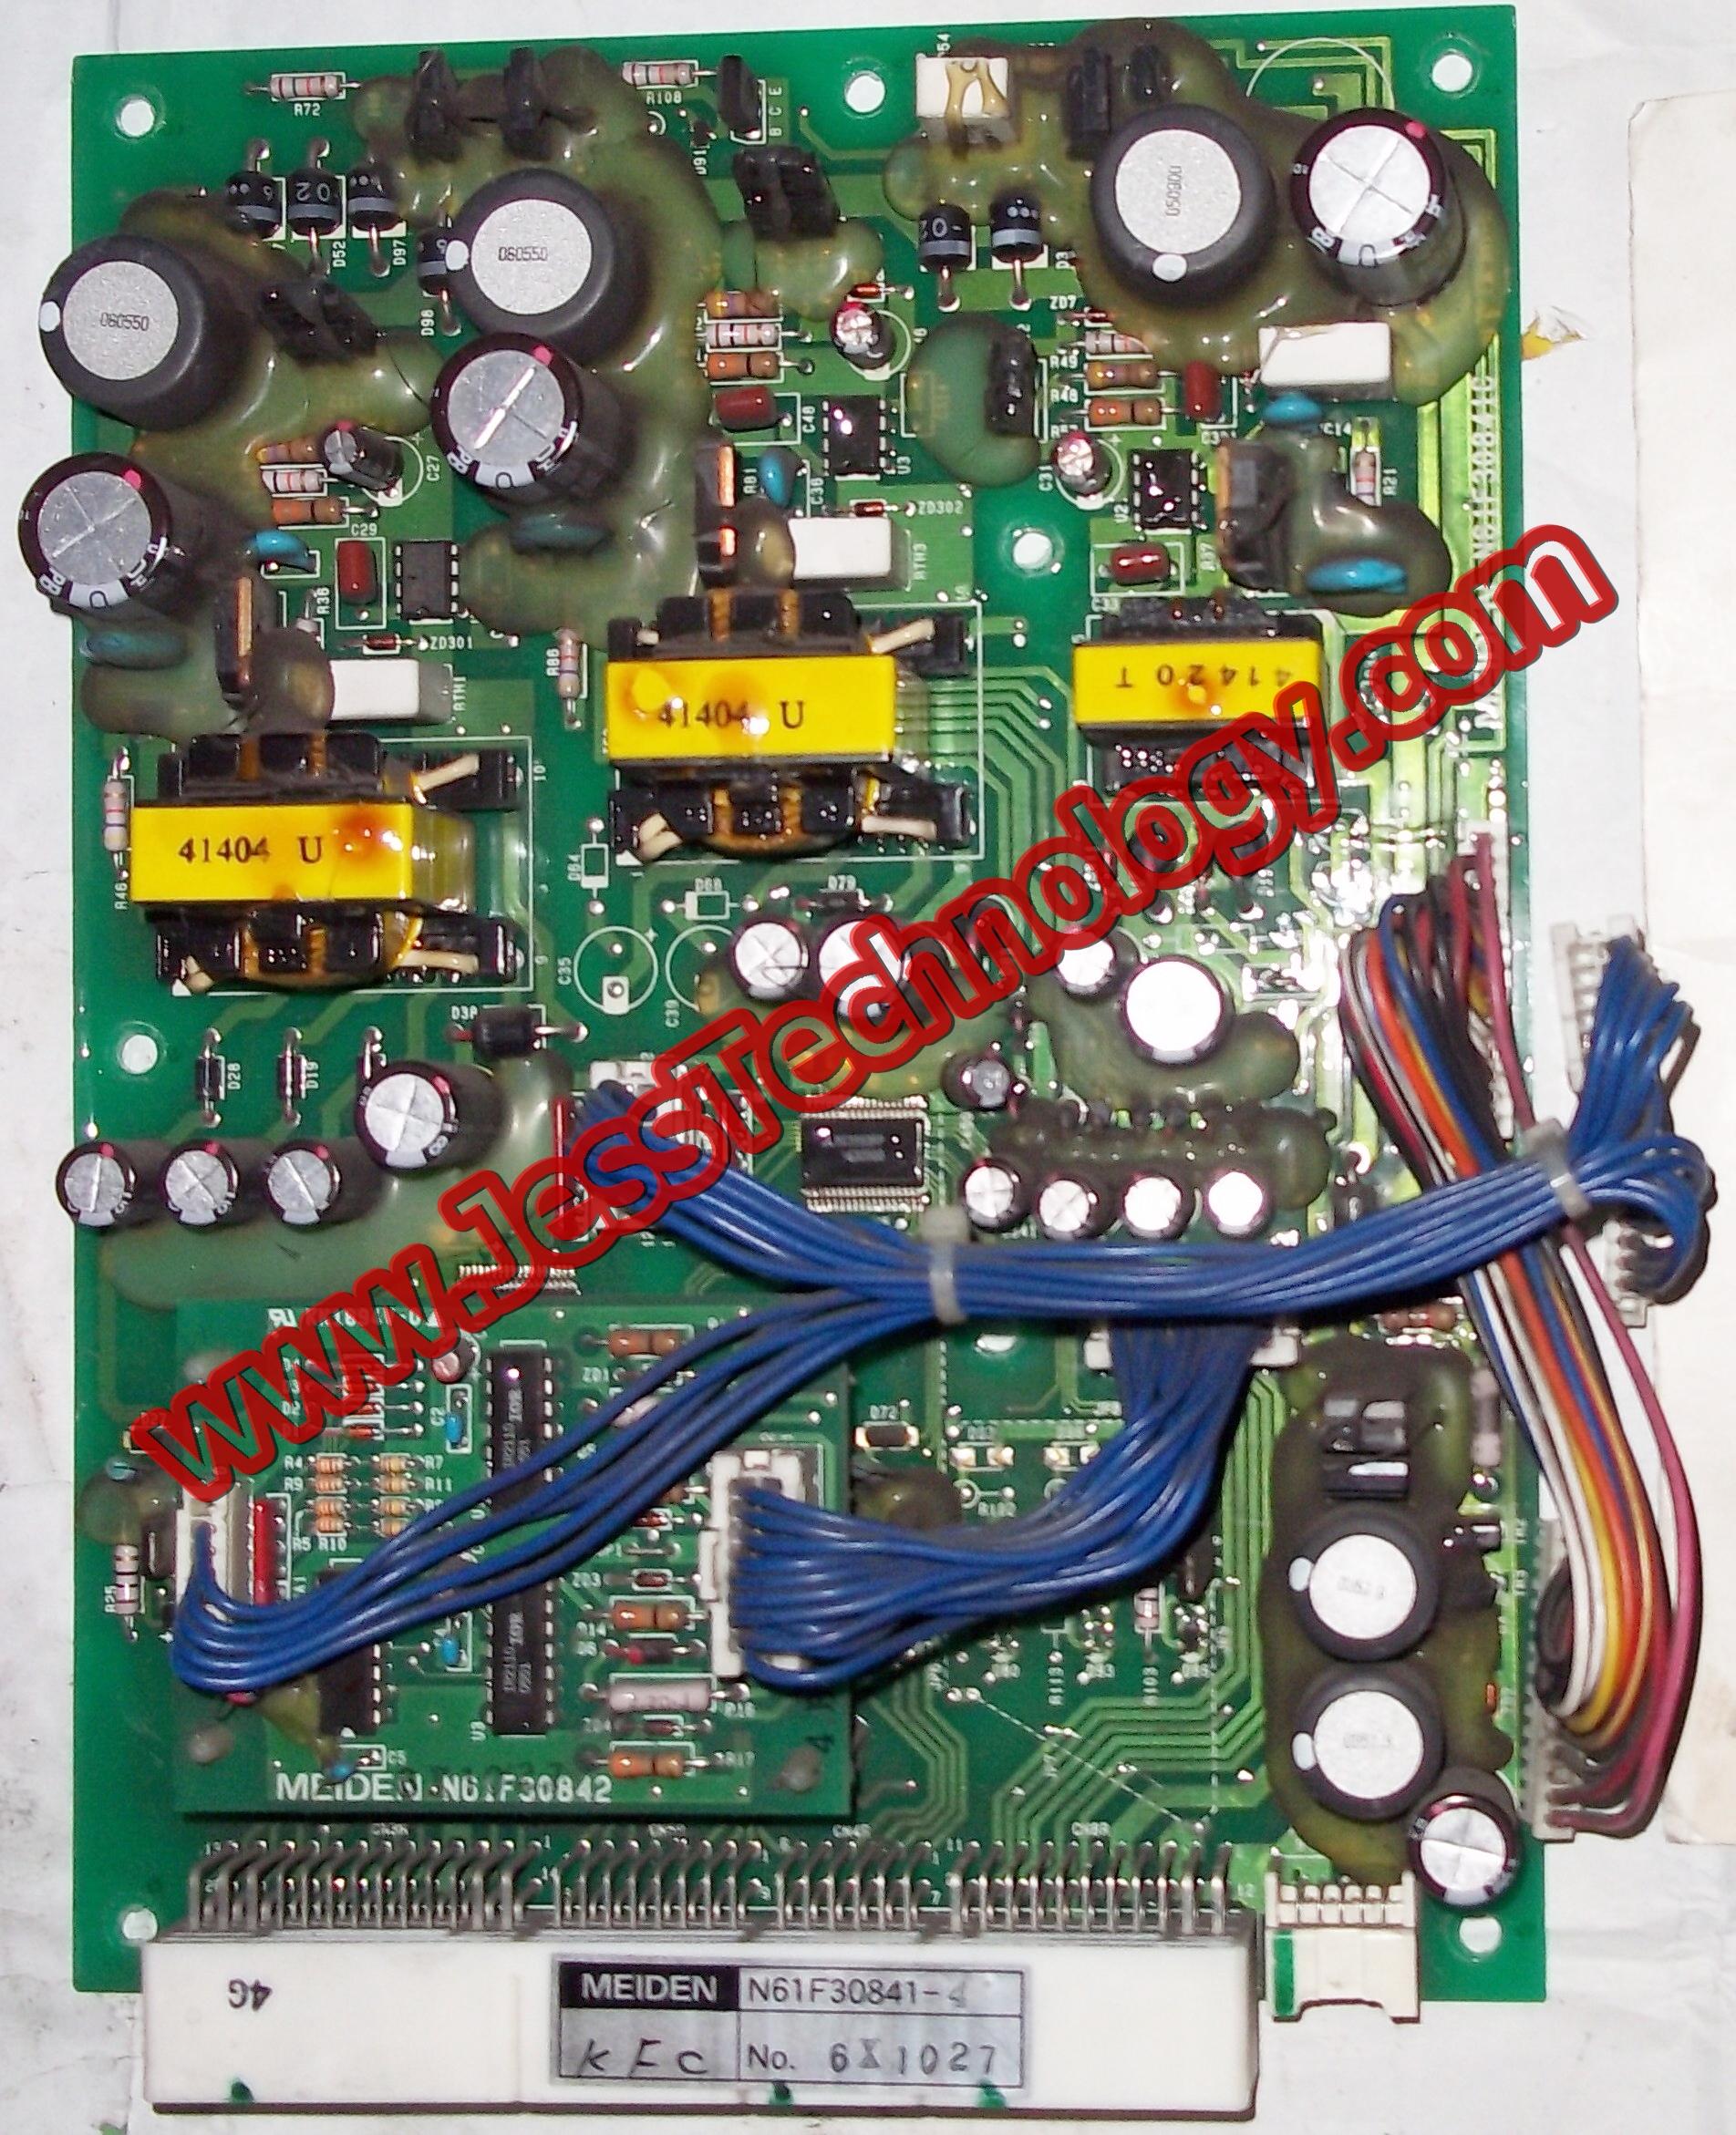 Repair N61F30841-4 MEIDEN  MEIDEN (N61F30841-4) in Malaysia, Singapore, Thailand, Indonesia